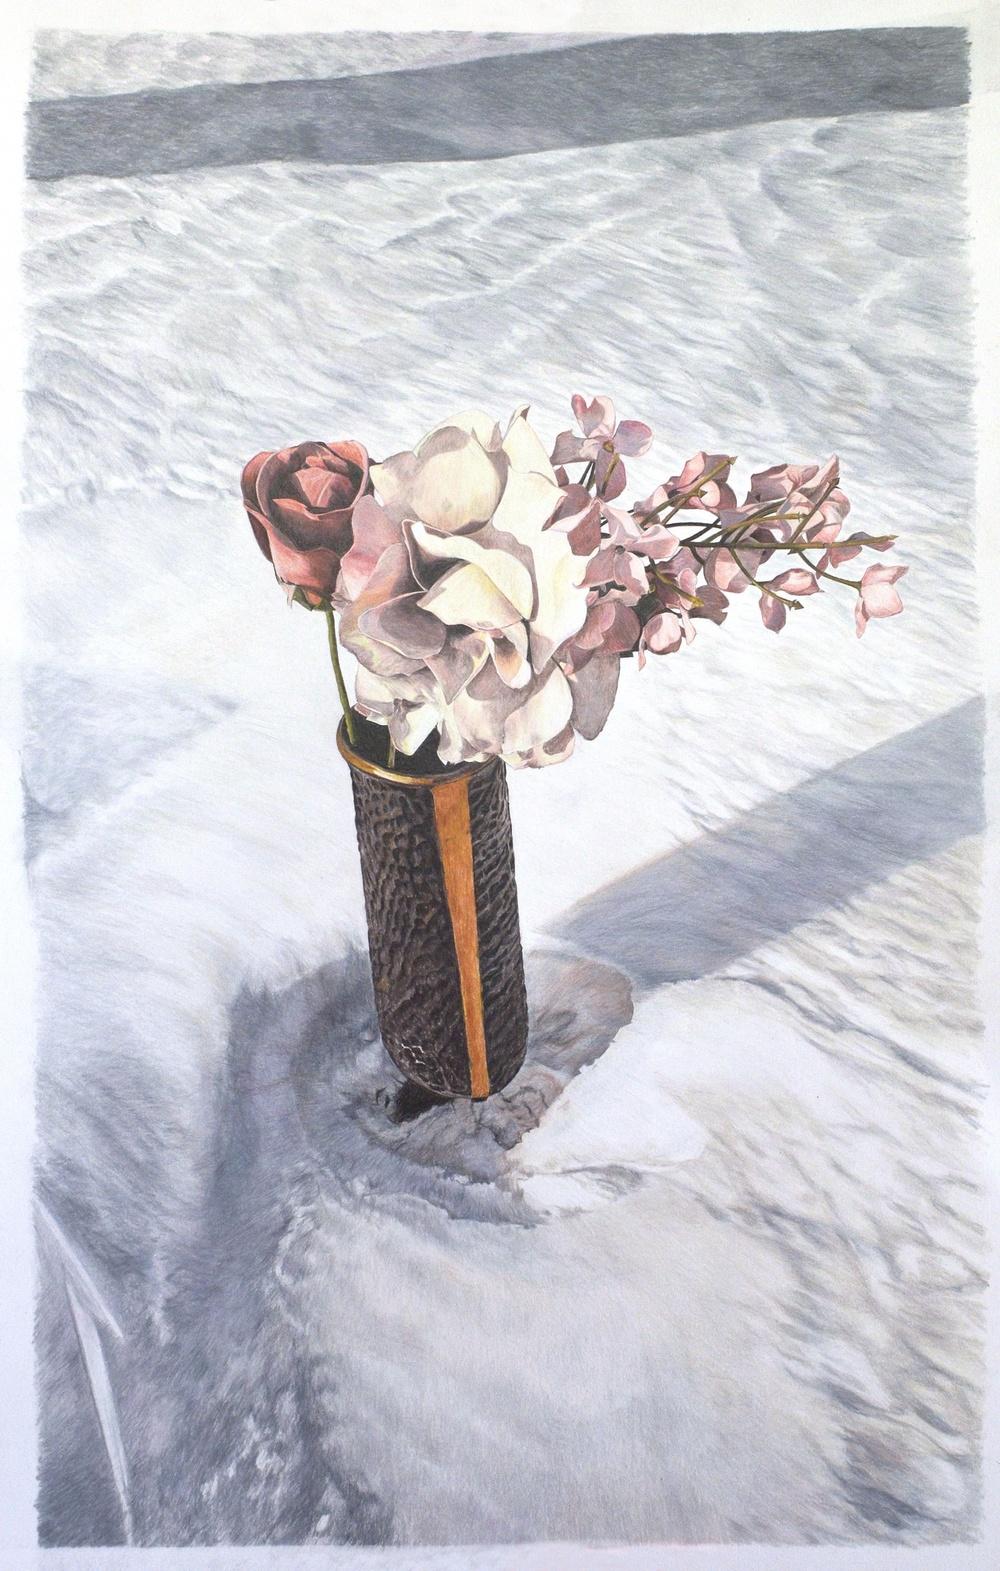 Snow Flowers #1